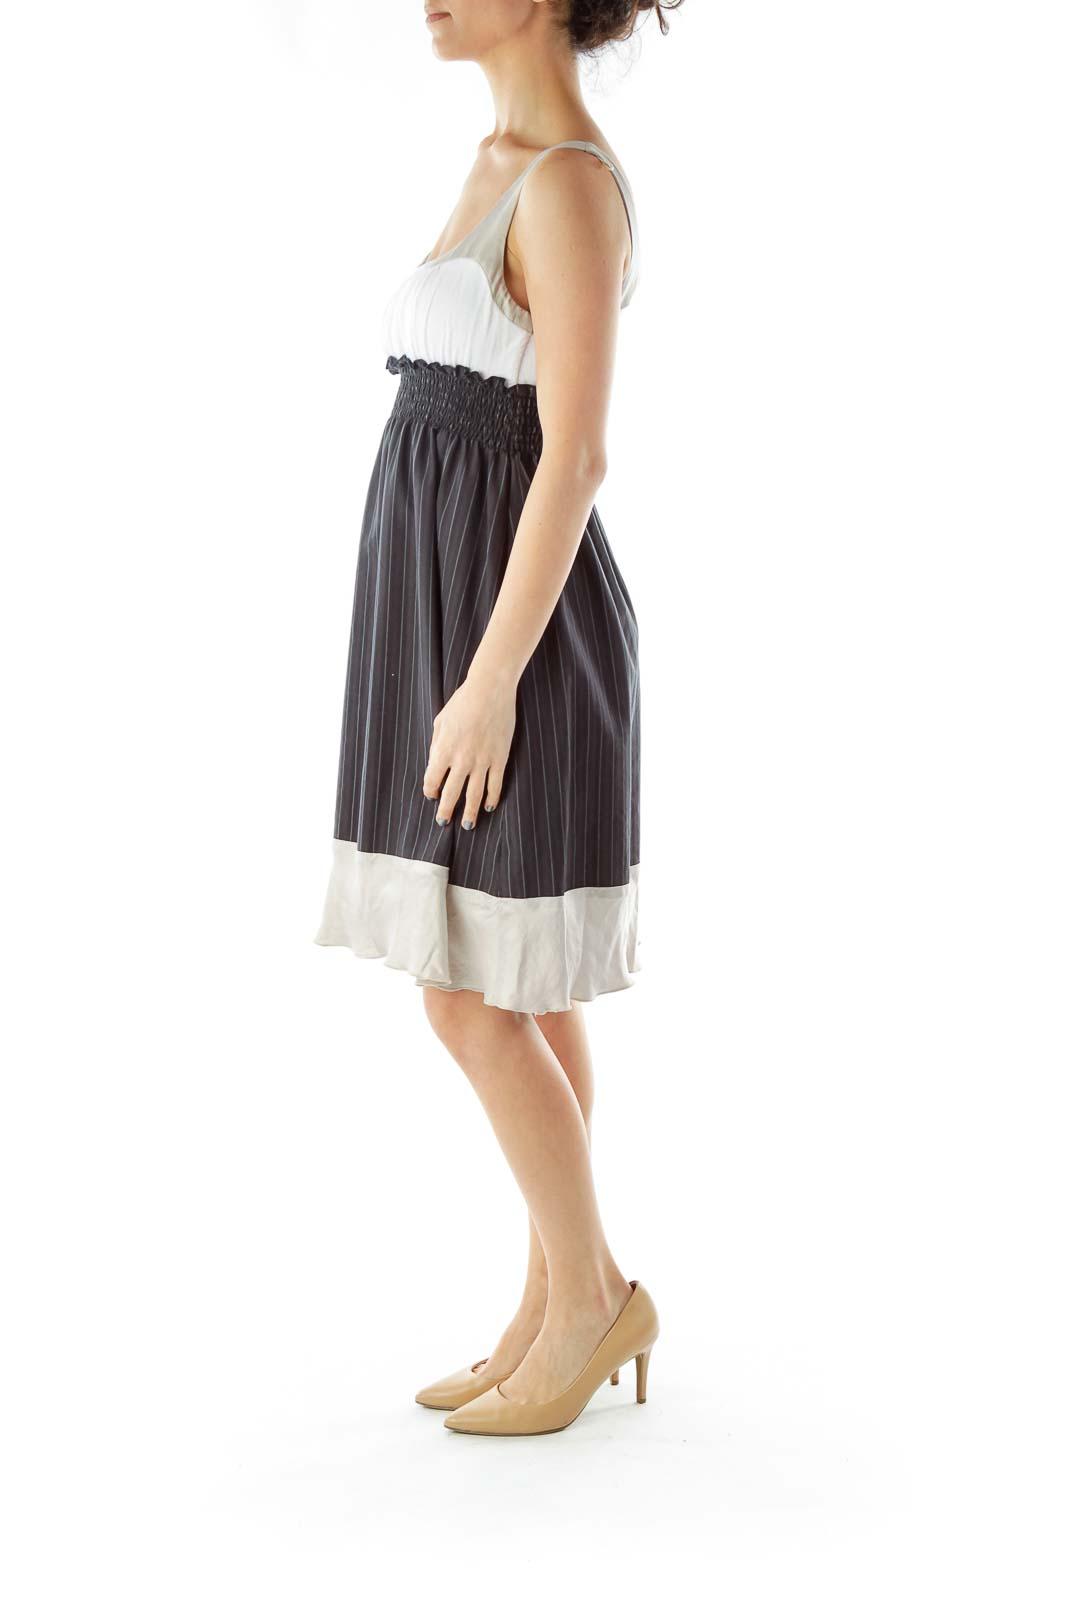 Blue Gray Pinstripe Dress